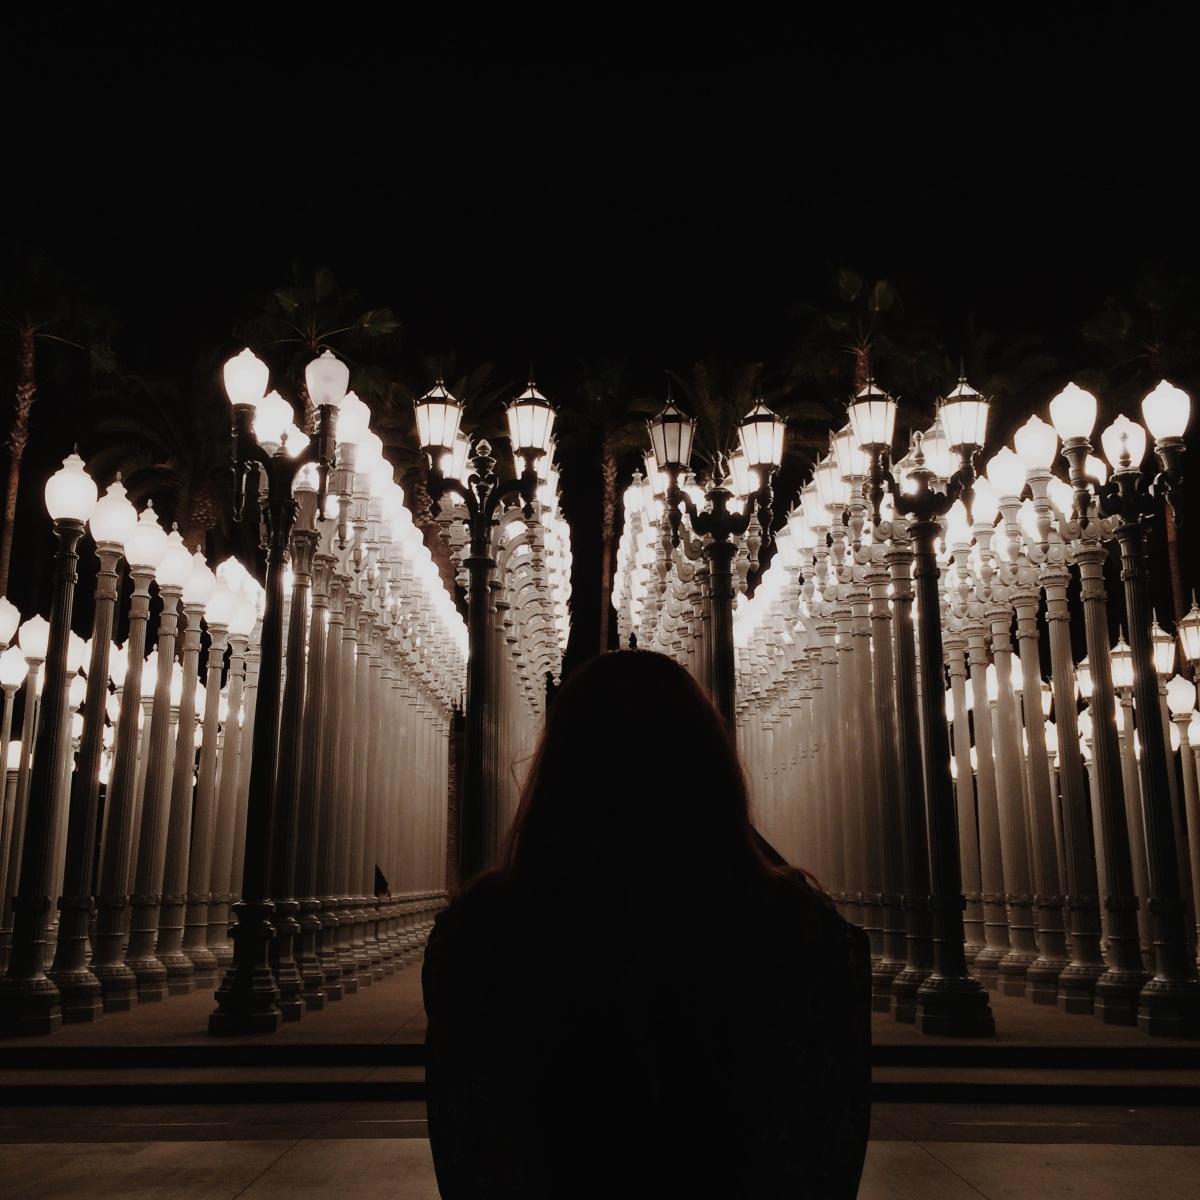 Arts and Entertainment Tuesday: LACMA's UrbanLight